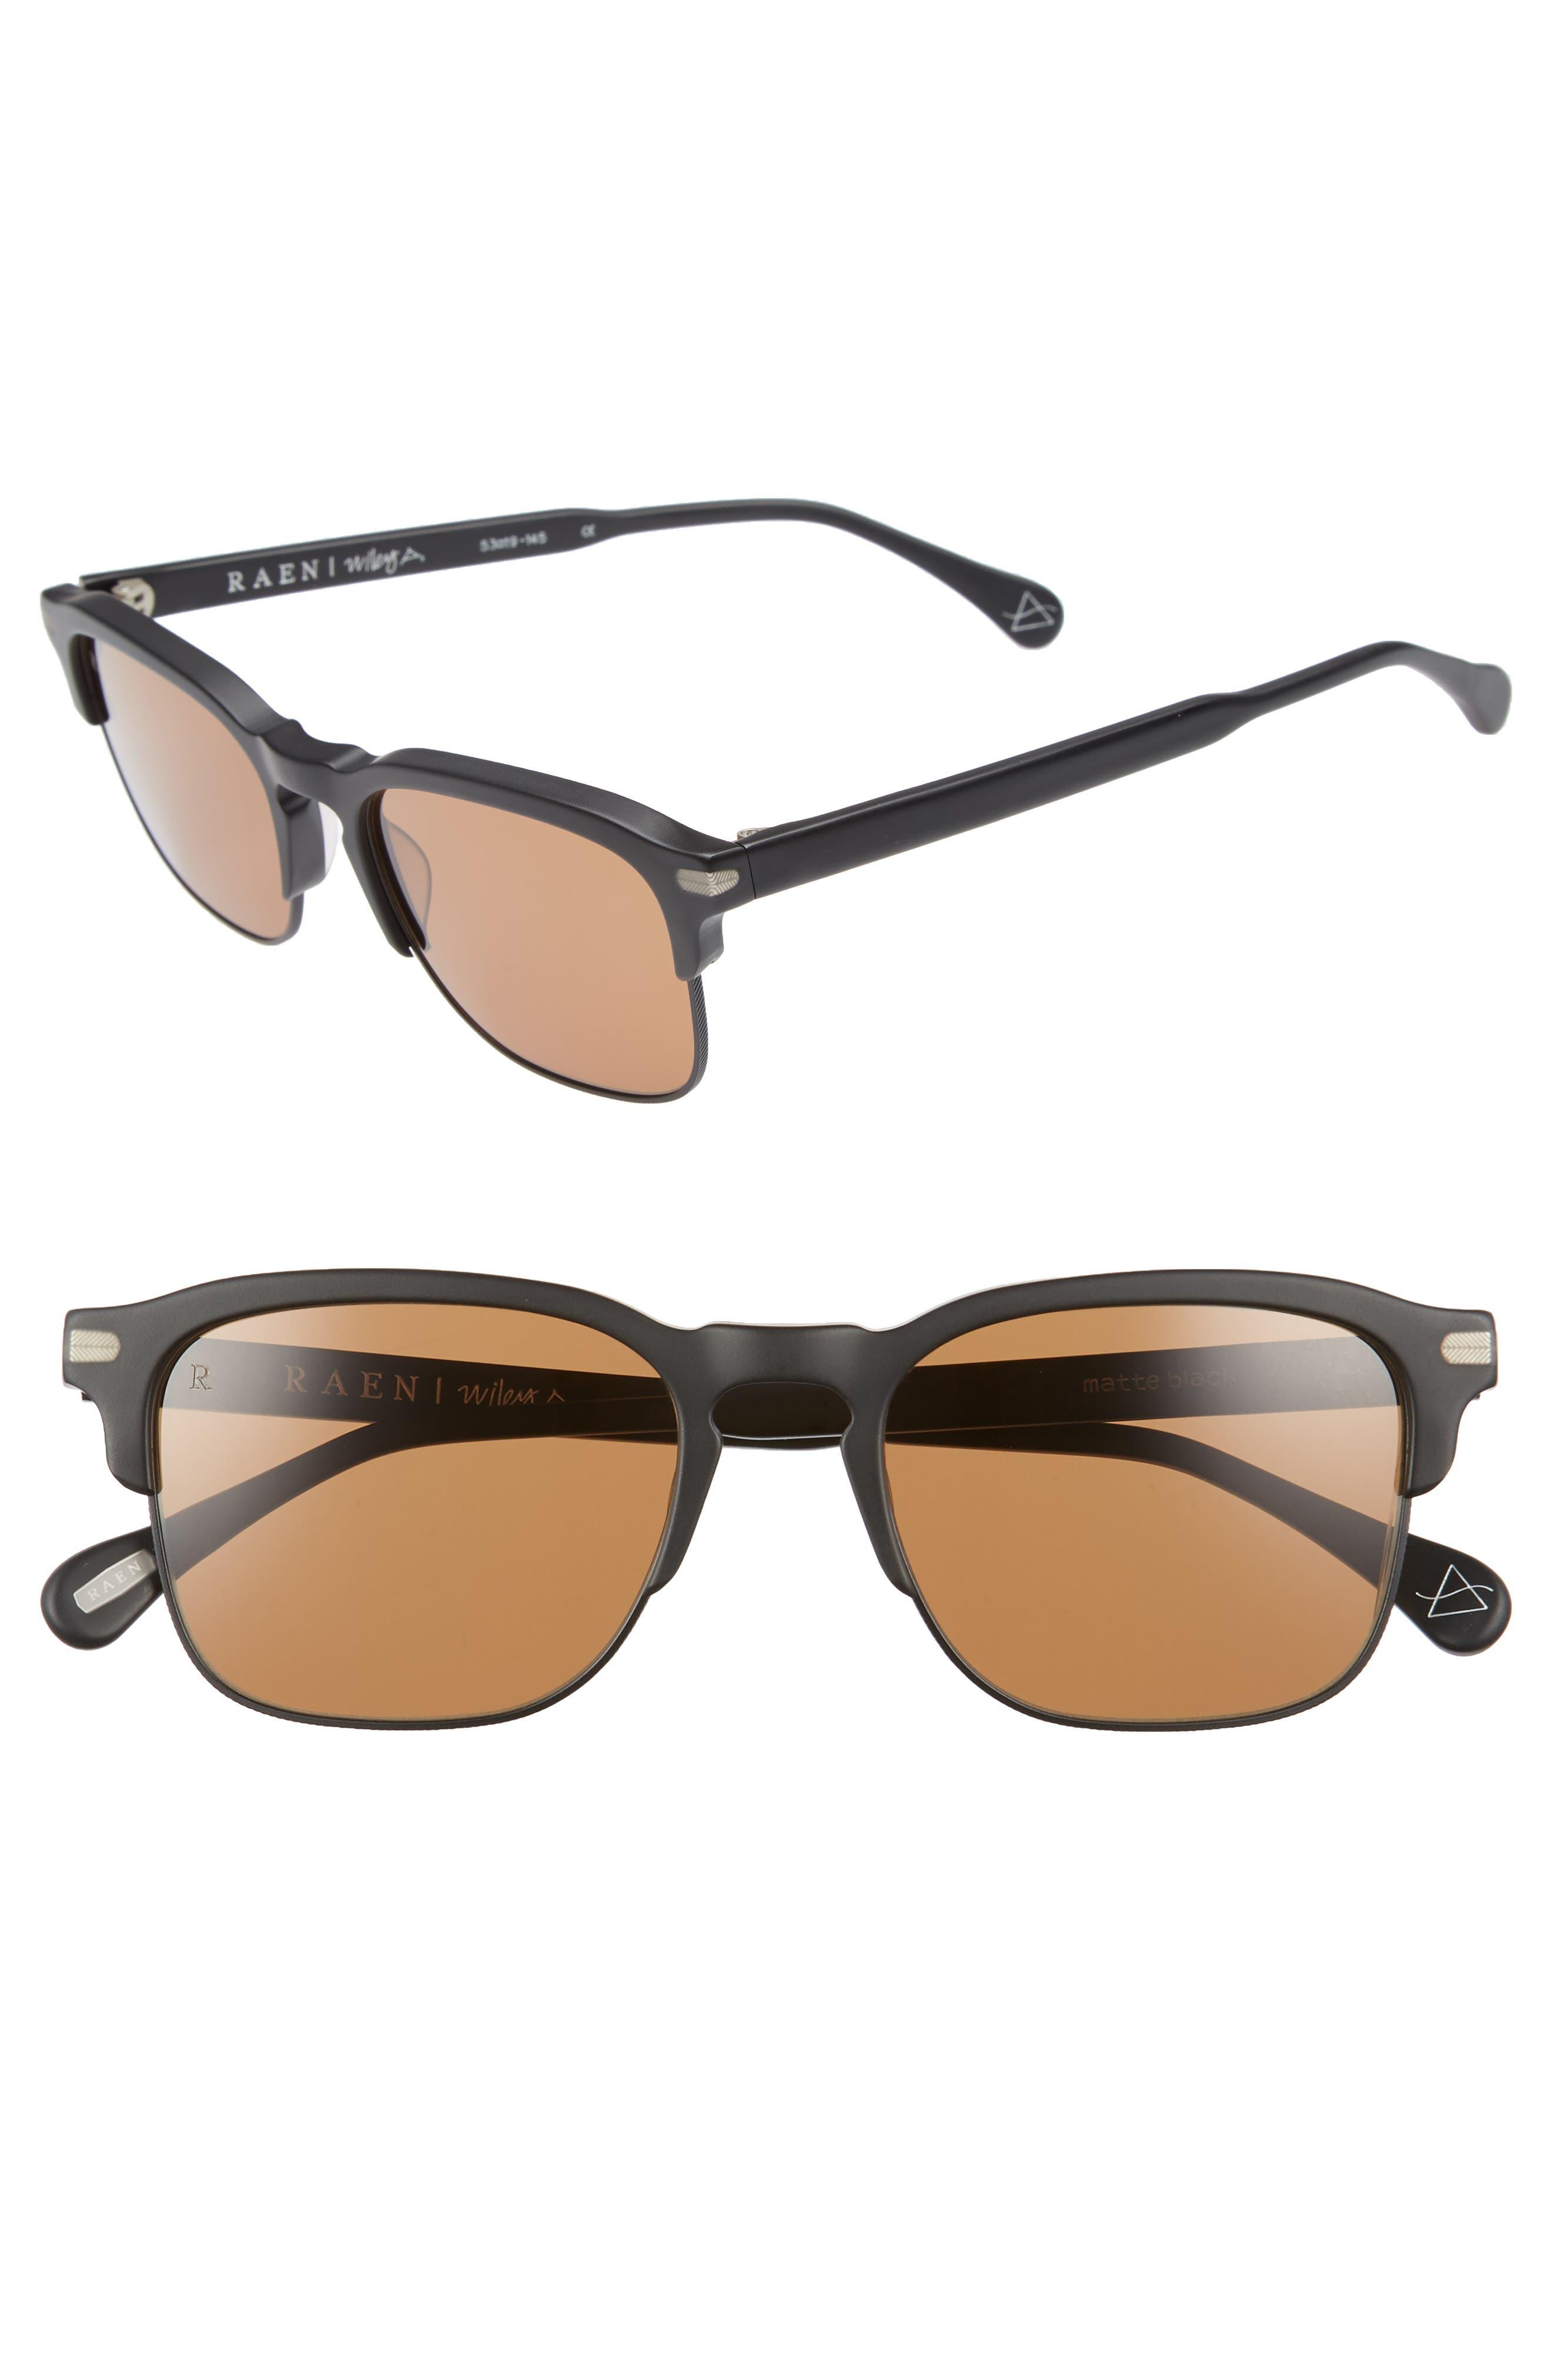 RAEN Wiley A 53mm Sunglasses